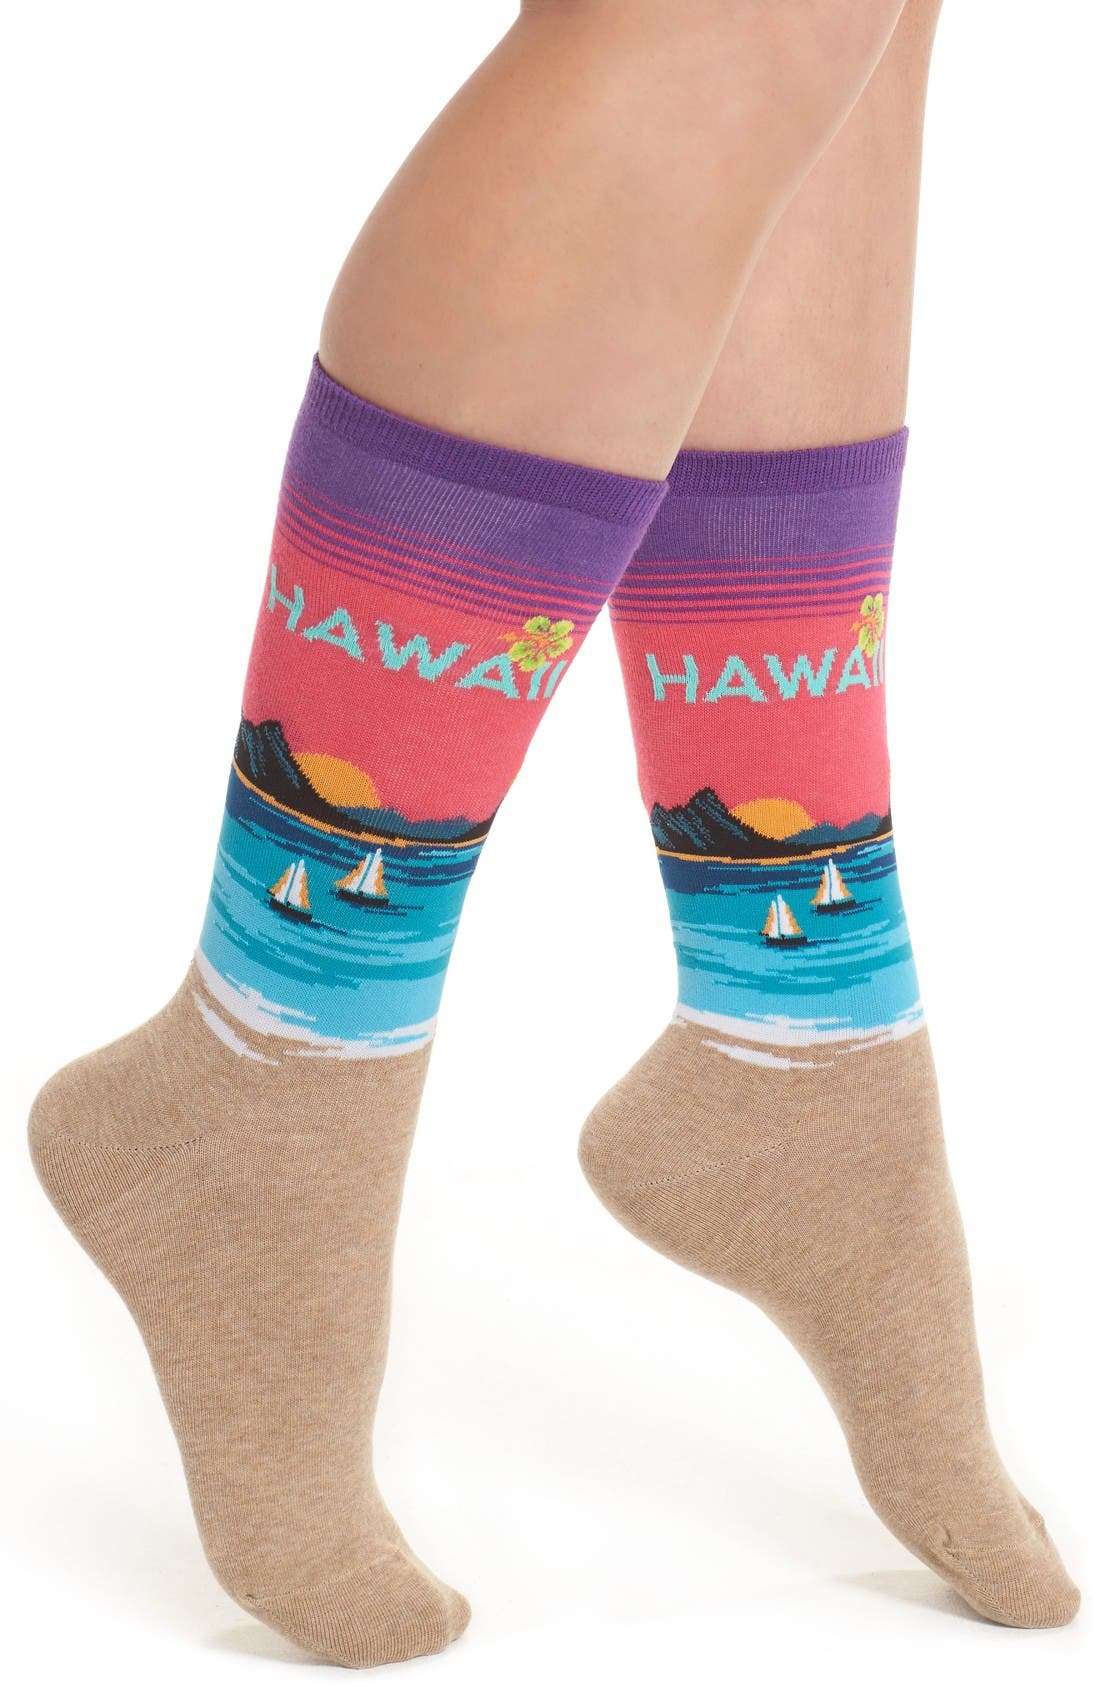 Alternate Image 1 Selected - Hot Sox Hawaii Crew Socks